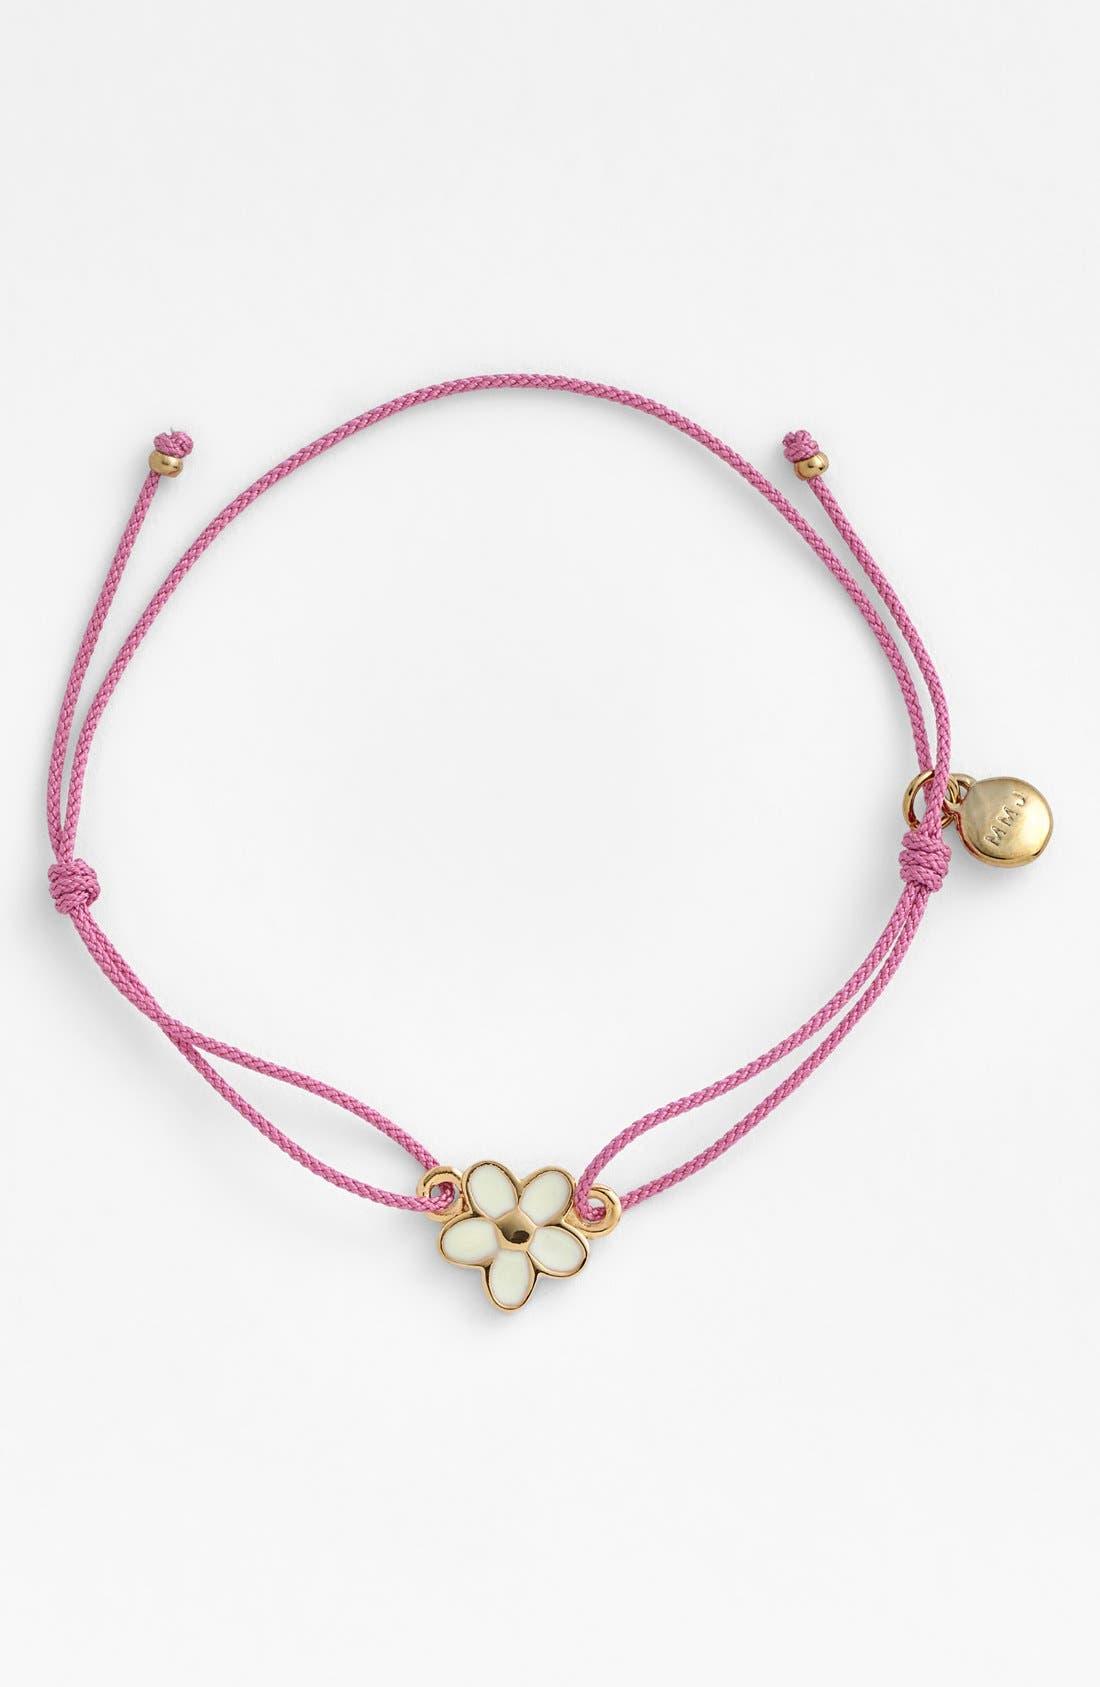 Main Image - MARC BY MARC JACOBS Flower Friendship Bracelet